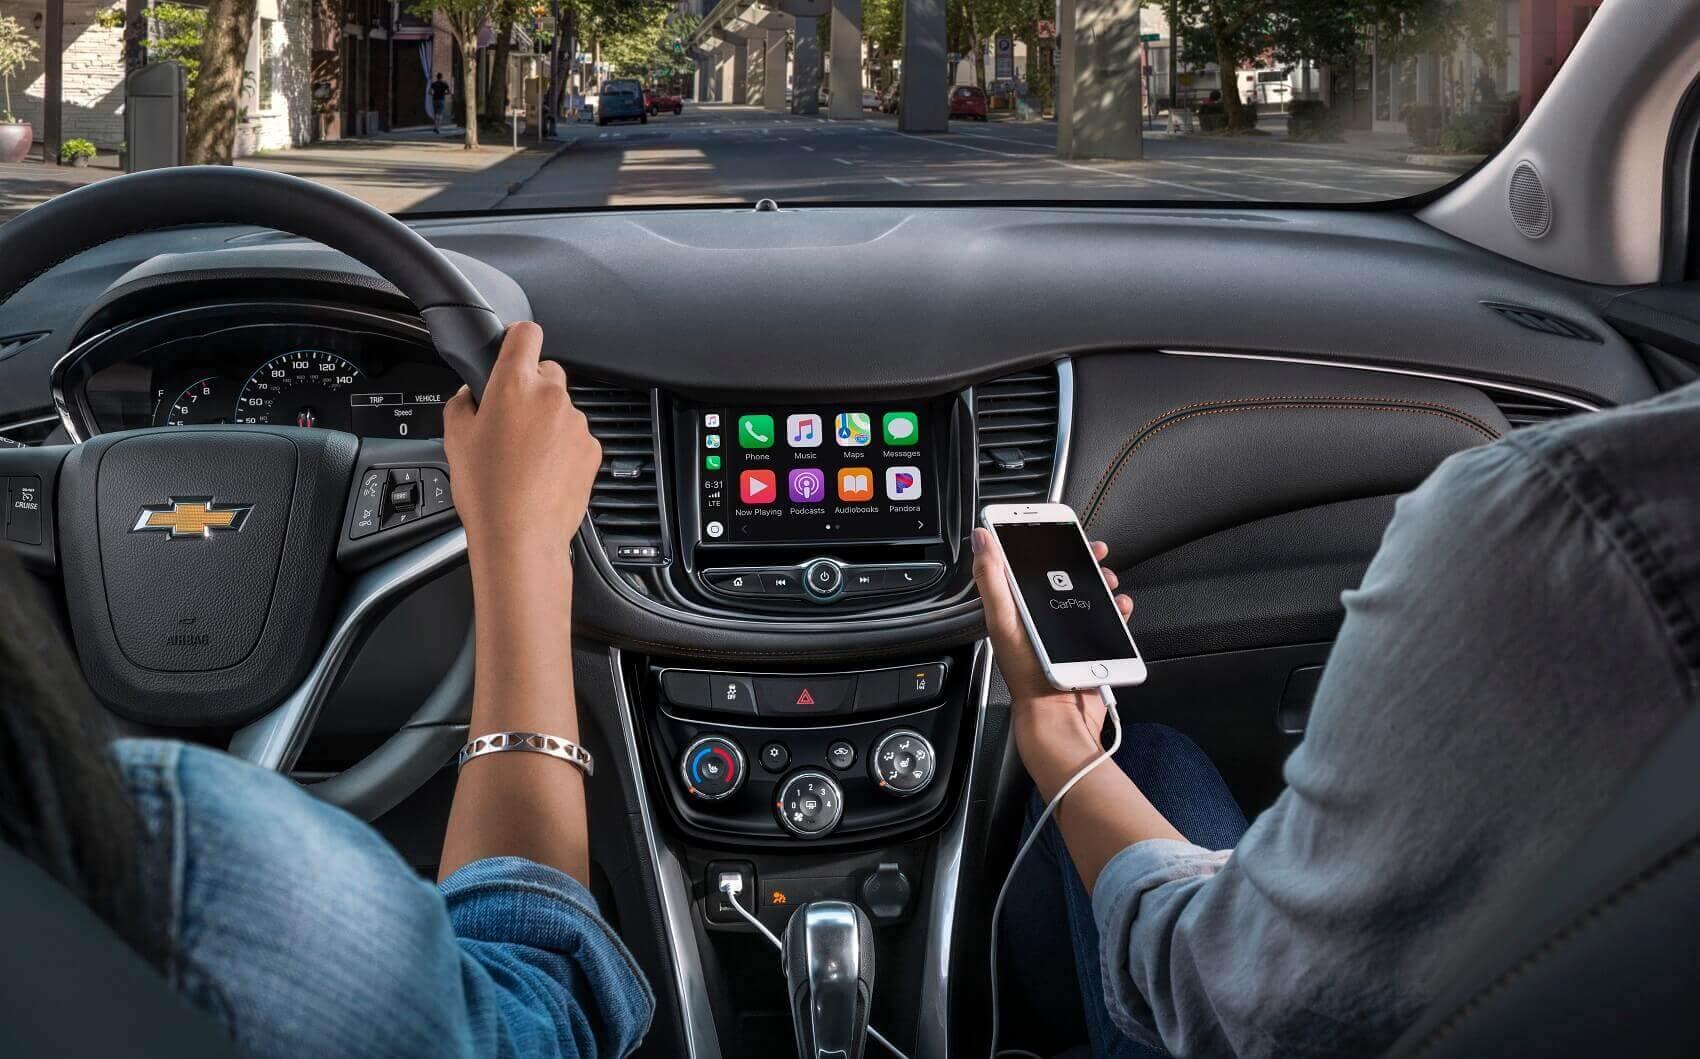 Chevrolet Trax Interior with Apple CarPlay® Technology